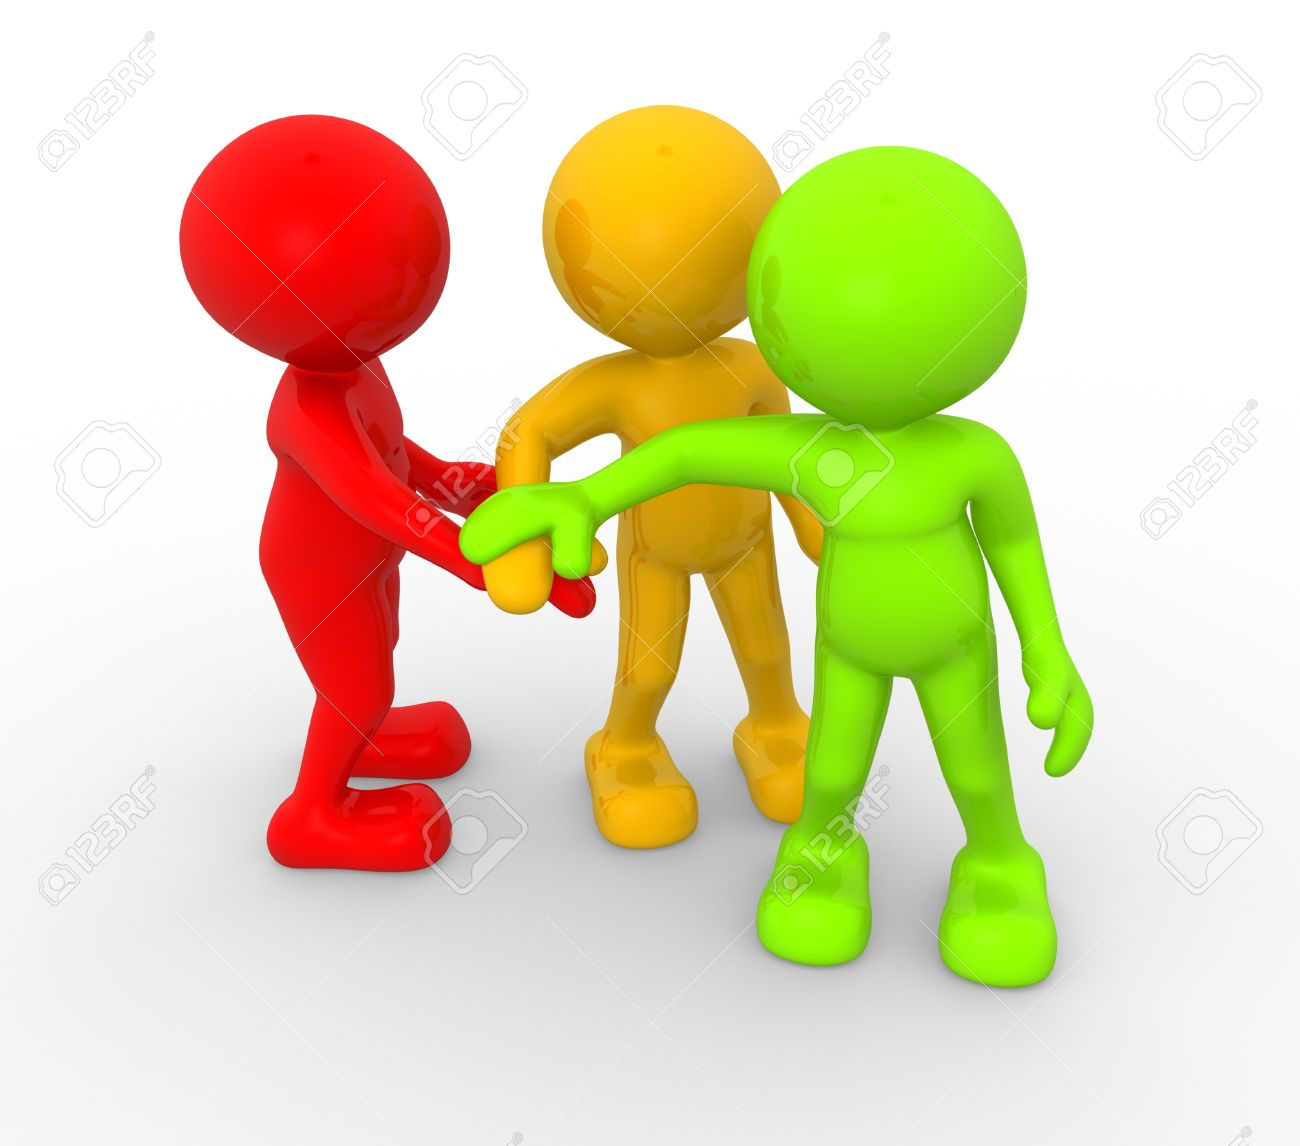 3d people - men, person together. Business team joining hands concept Standard-Bild - 17639990